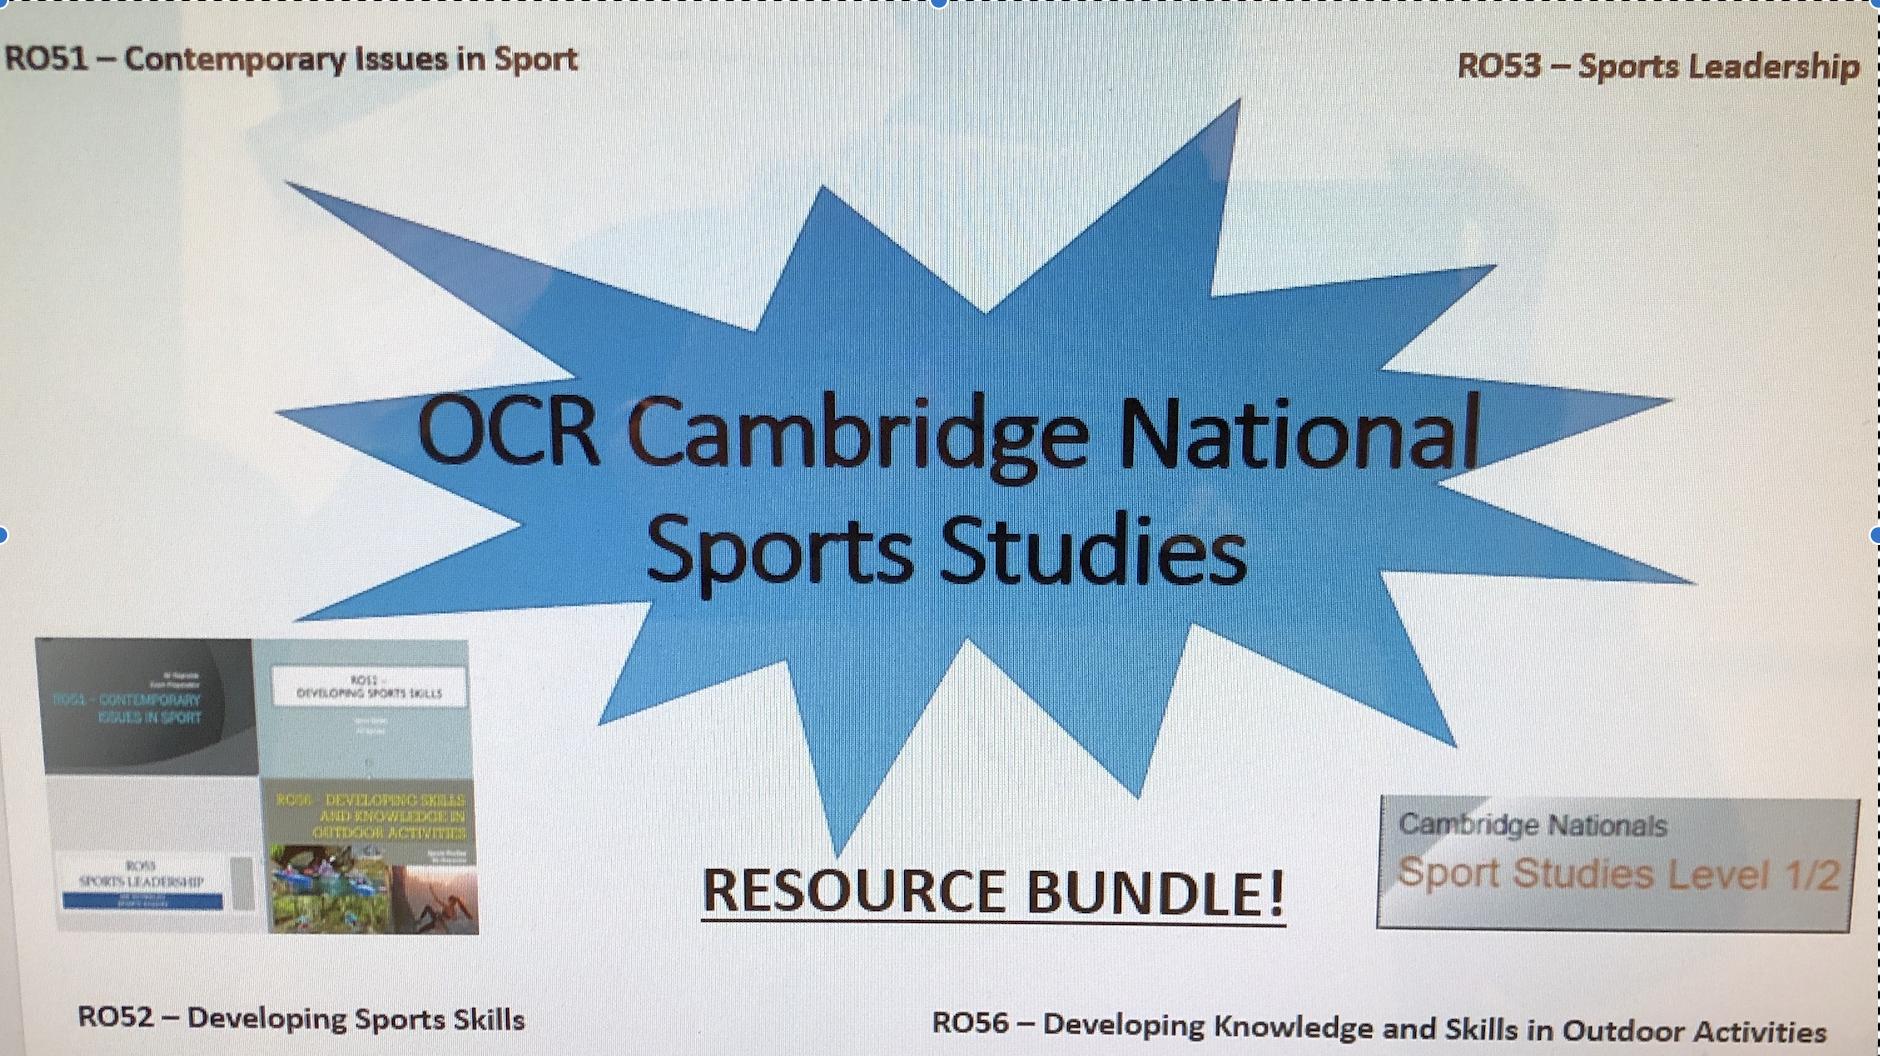 OCR Cambridge National Sports Studies